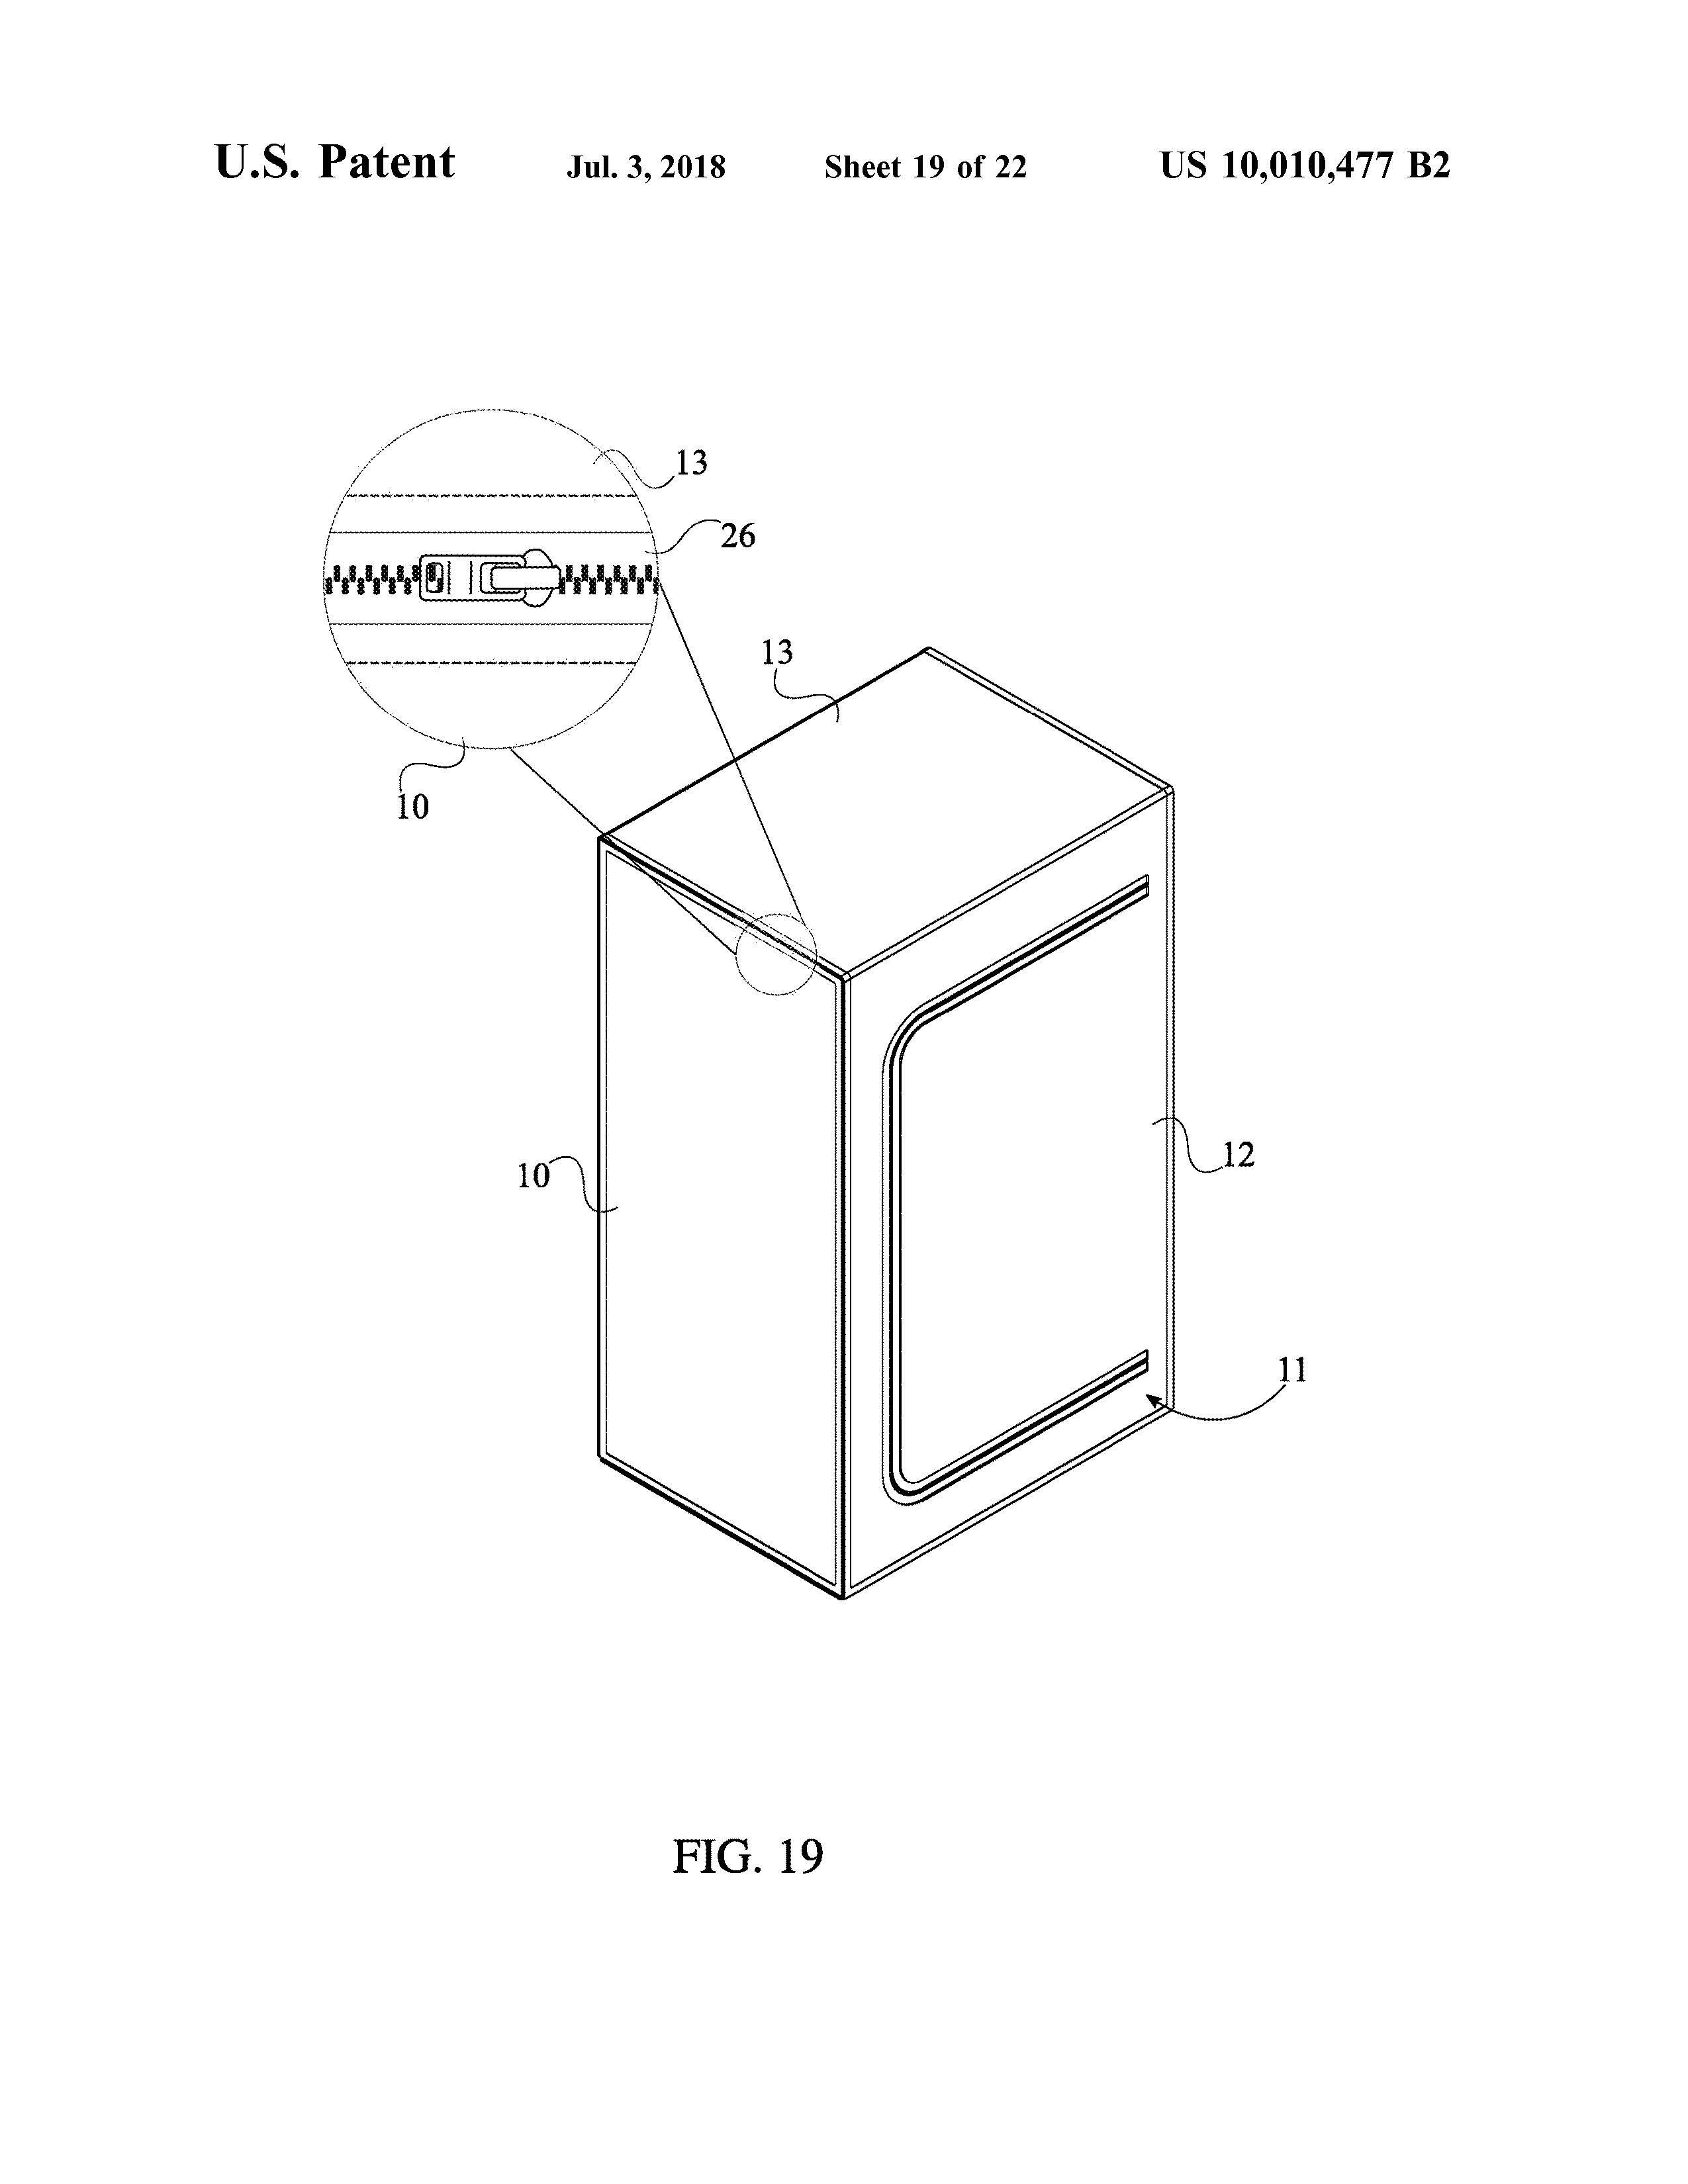 Sauna Tent Patent Page 21